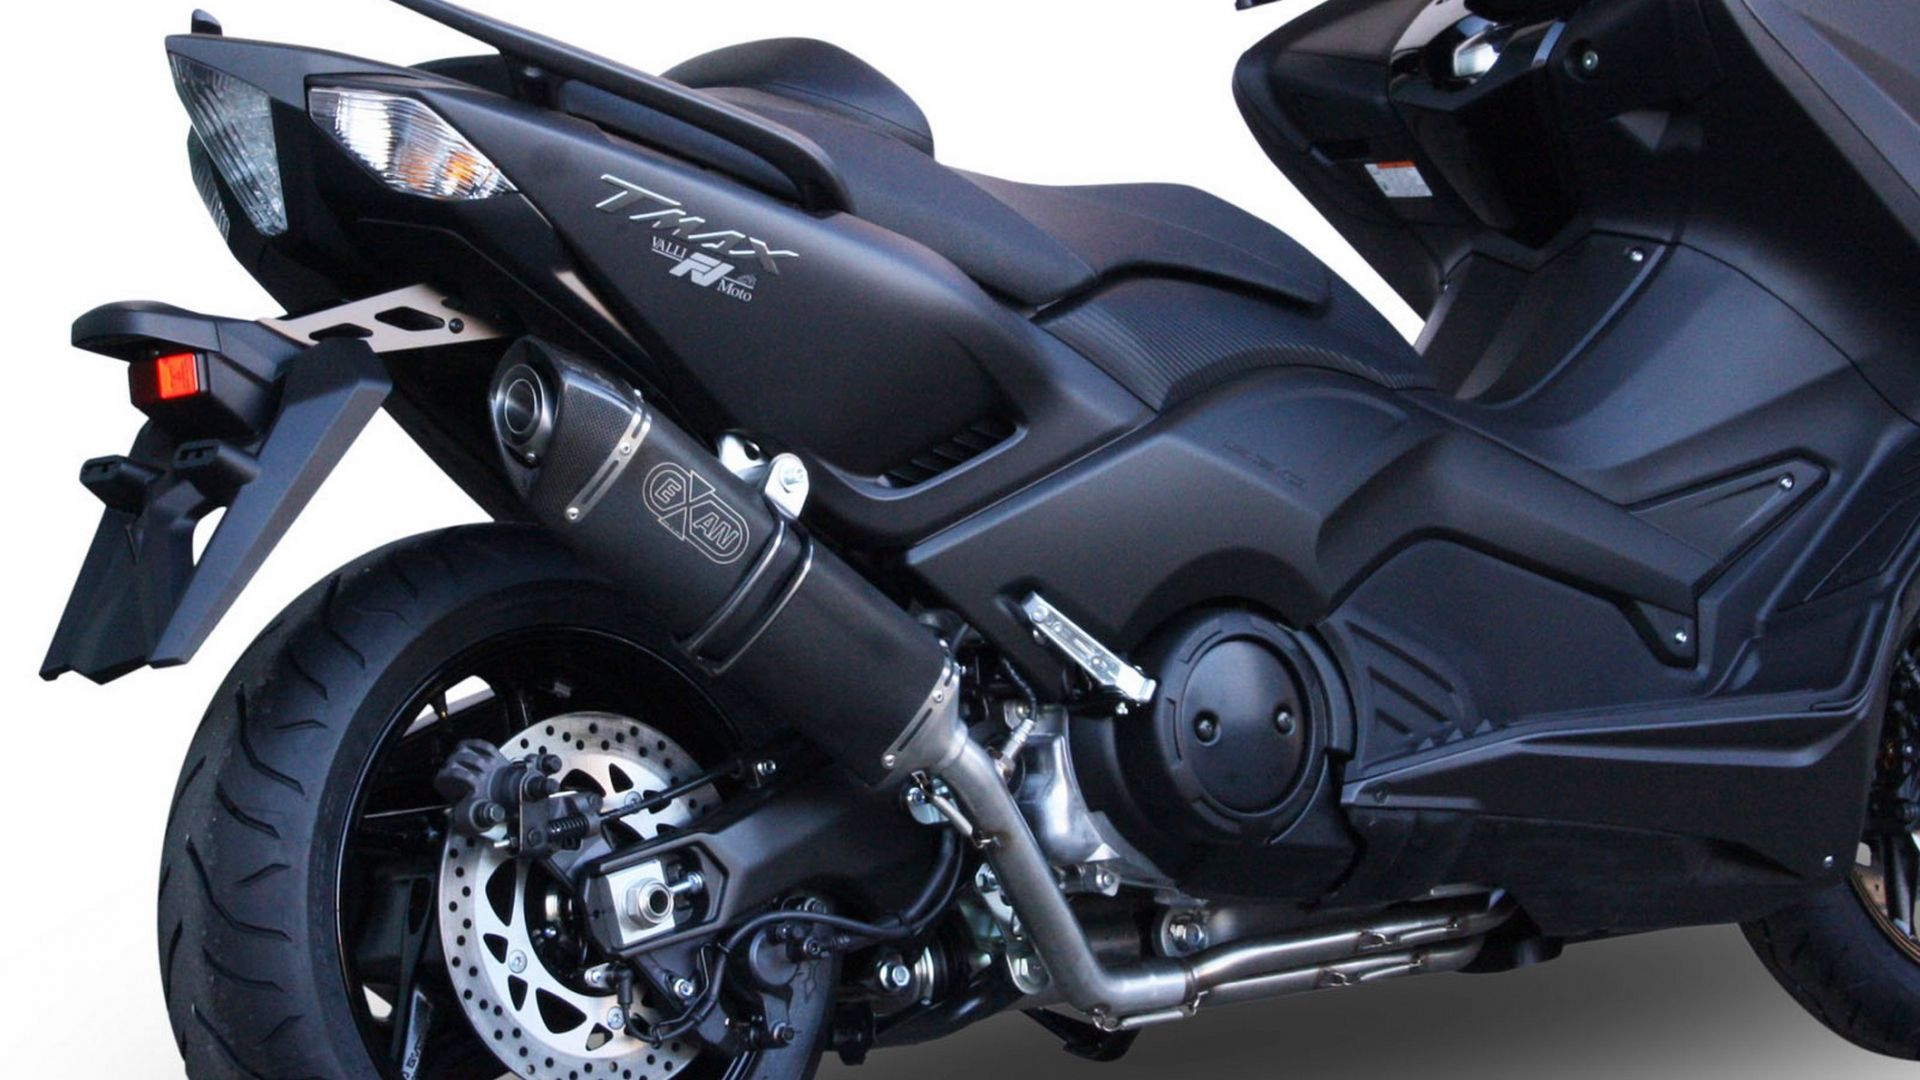 accessori moto exan scarico ovale x black per yamaha tmax 530 motorbox. Black Bedroom Furniture Sets. Home Design Ideas